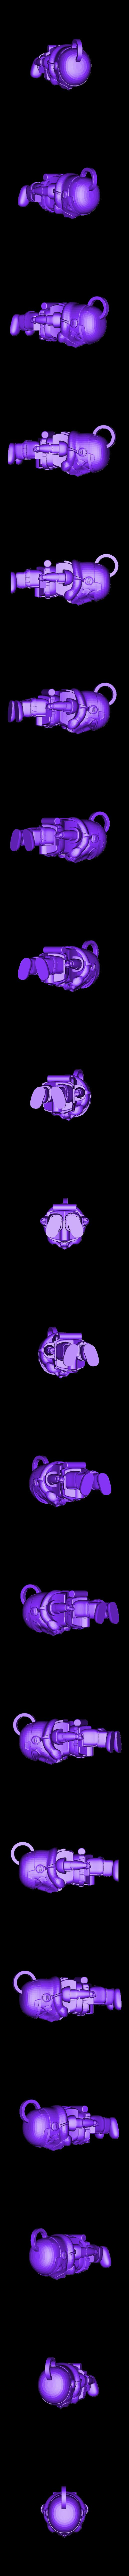 1 full trooper_fixed.STL Download free STL file STORMTROOPER KEY CHAIN • 3D printing template, paltony22